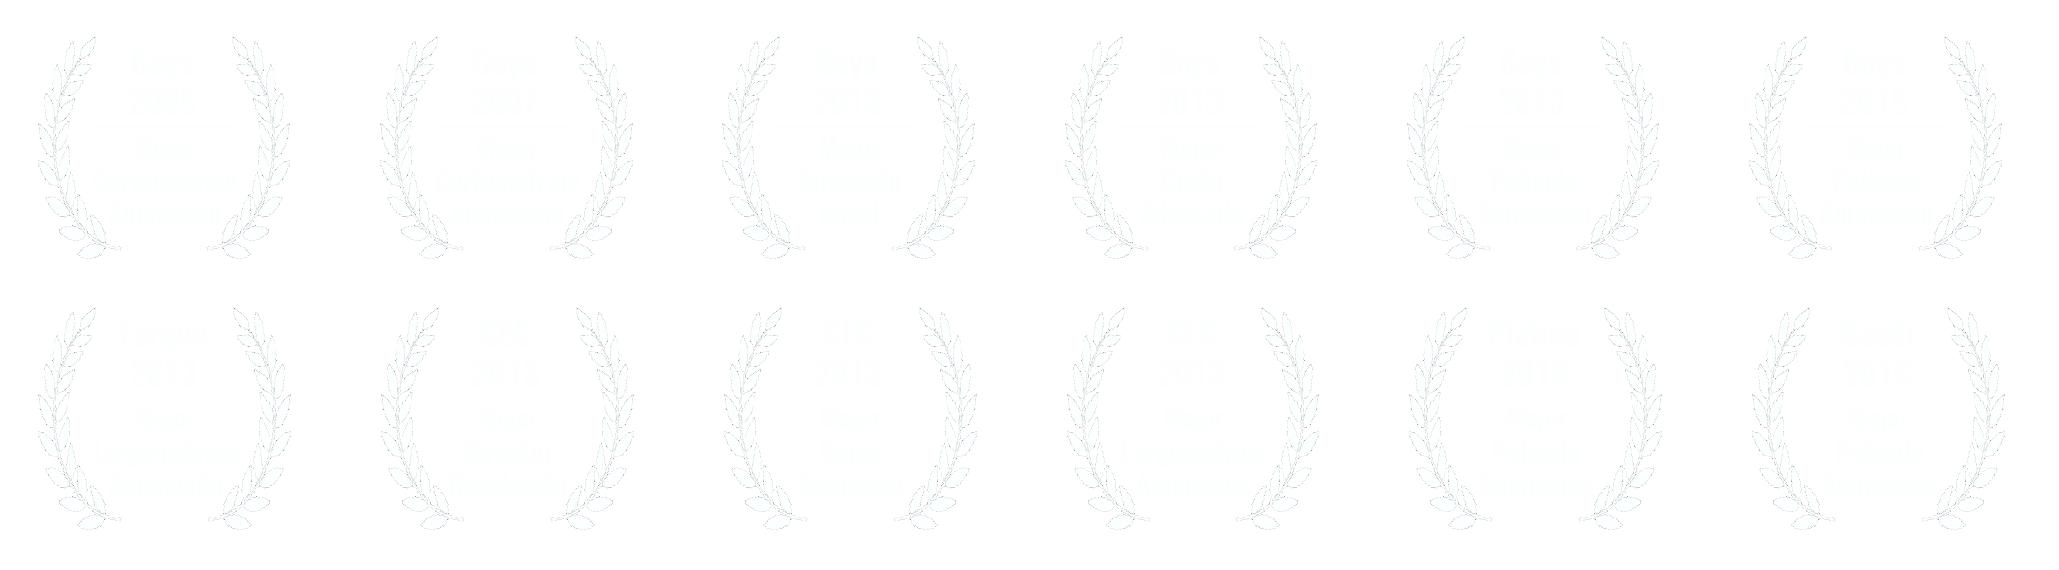 img_lbox-premios-12-